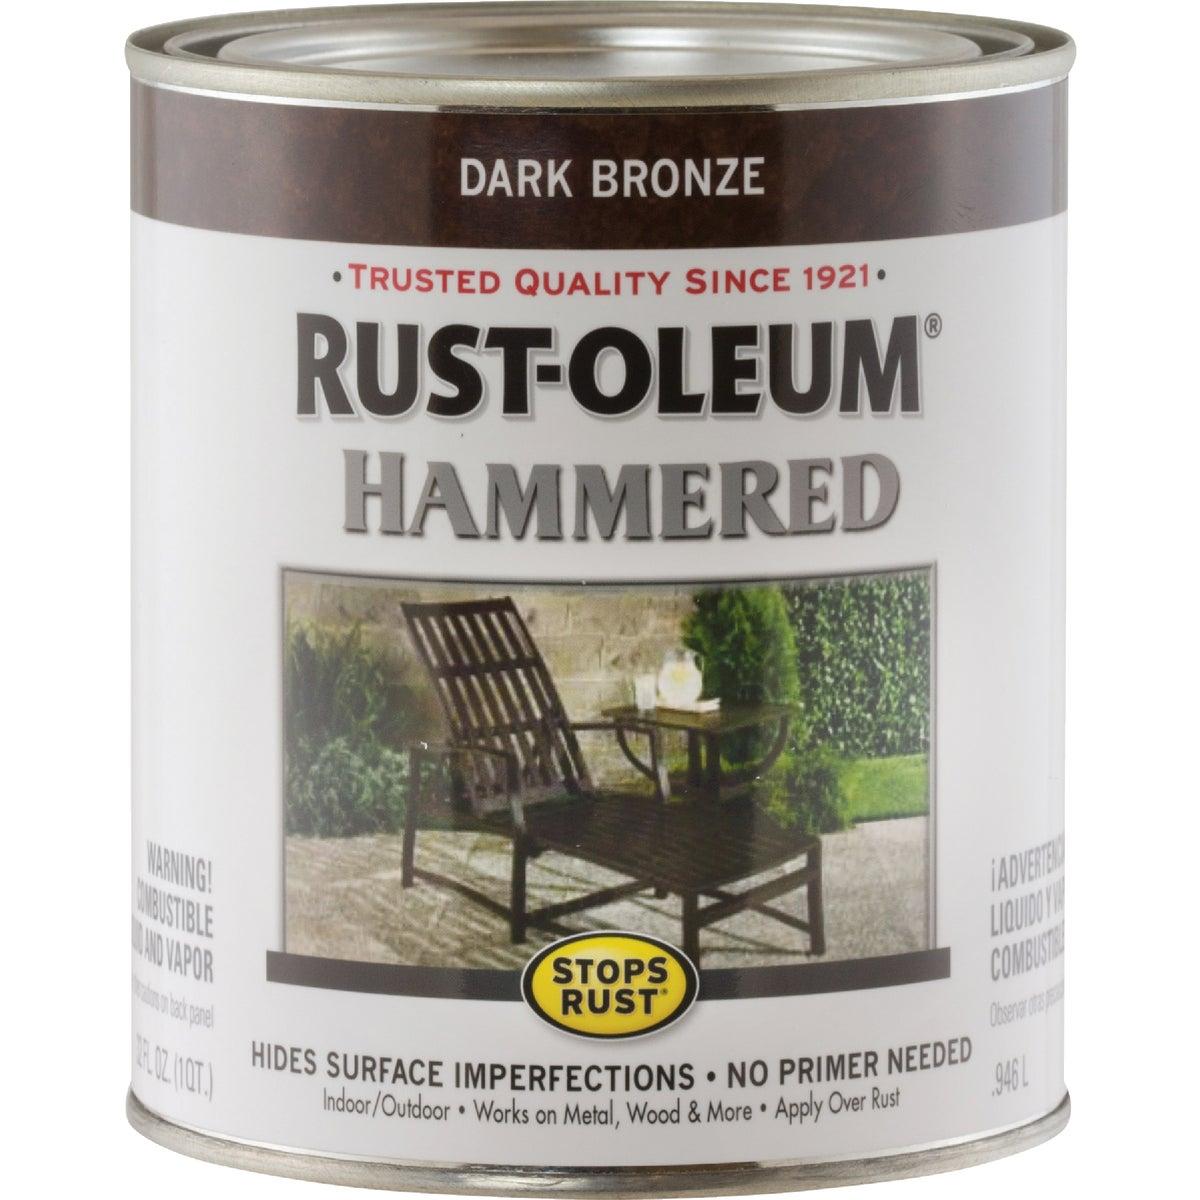 DK BRONZE HAMMERED PAINT - 239075 by Rustoleum